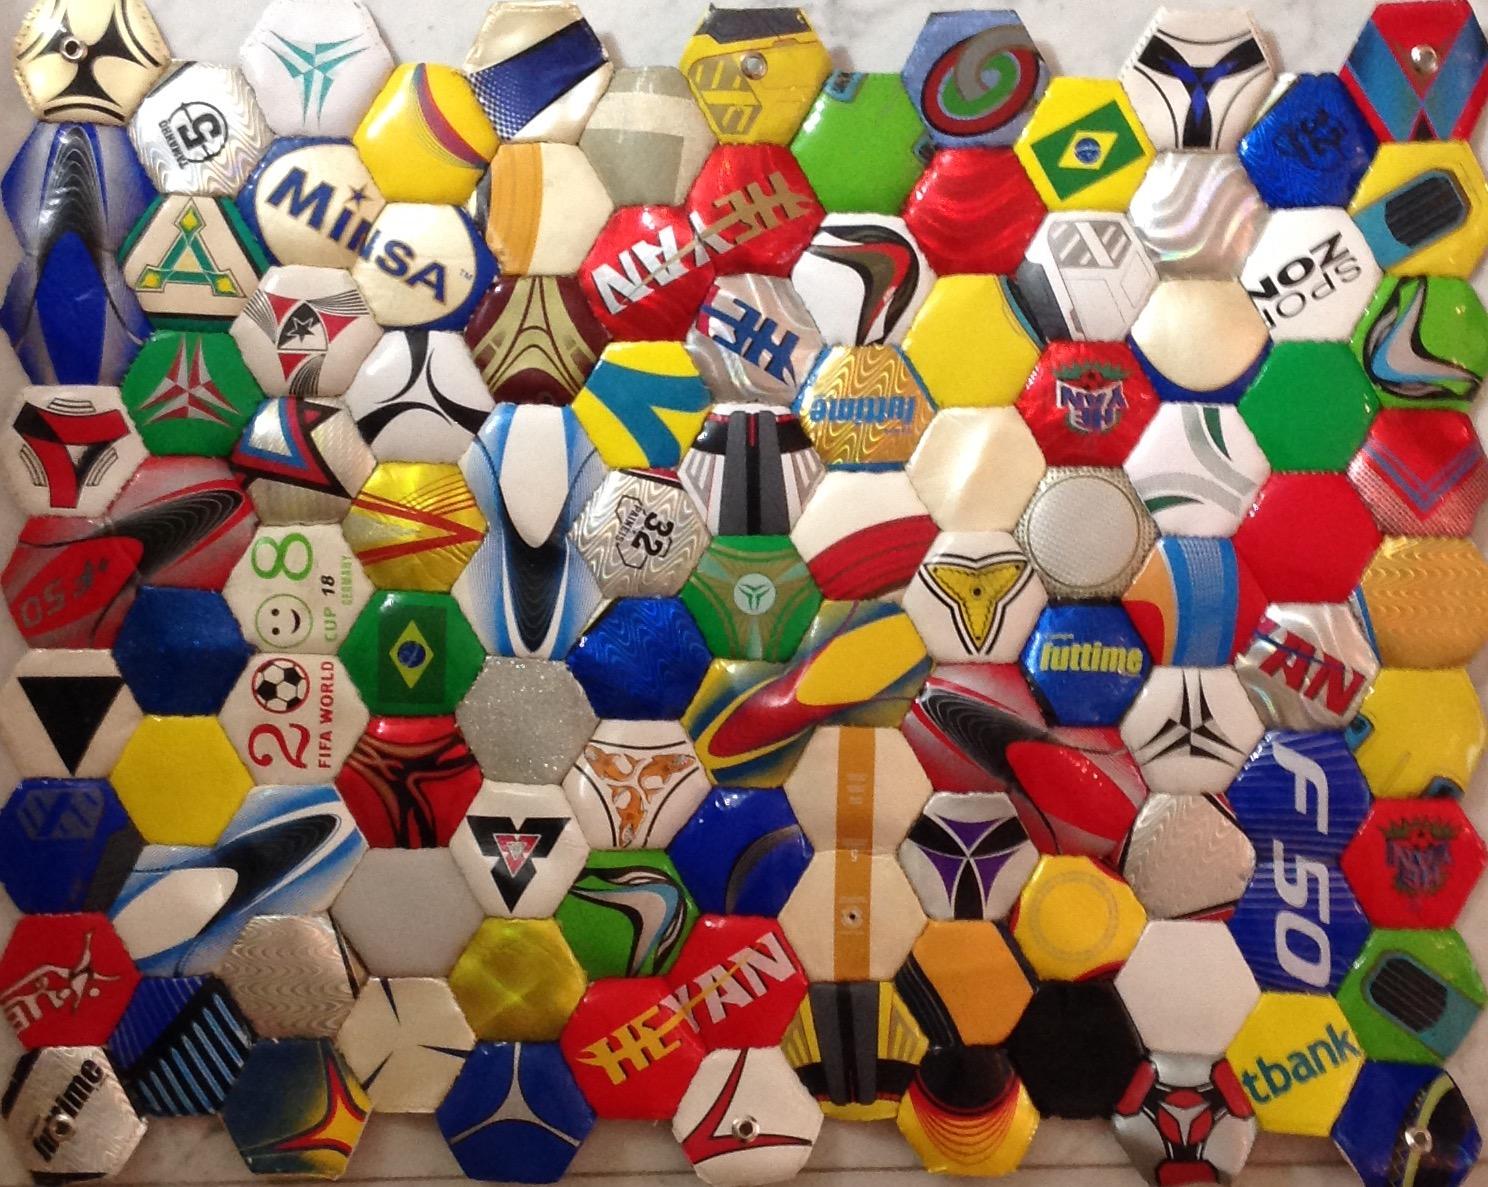 FB42 - Felipe Barbosa - Cada um por si [